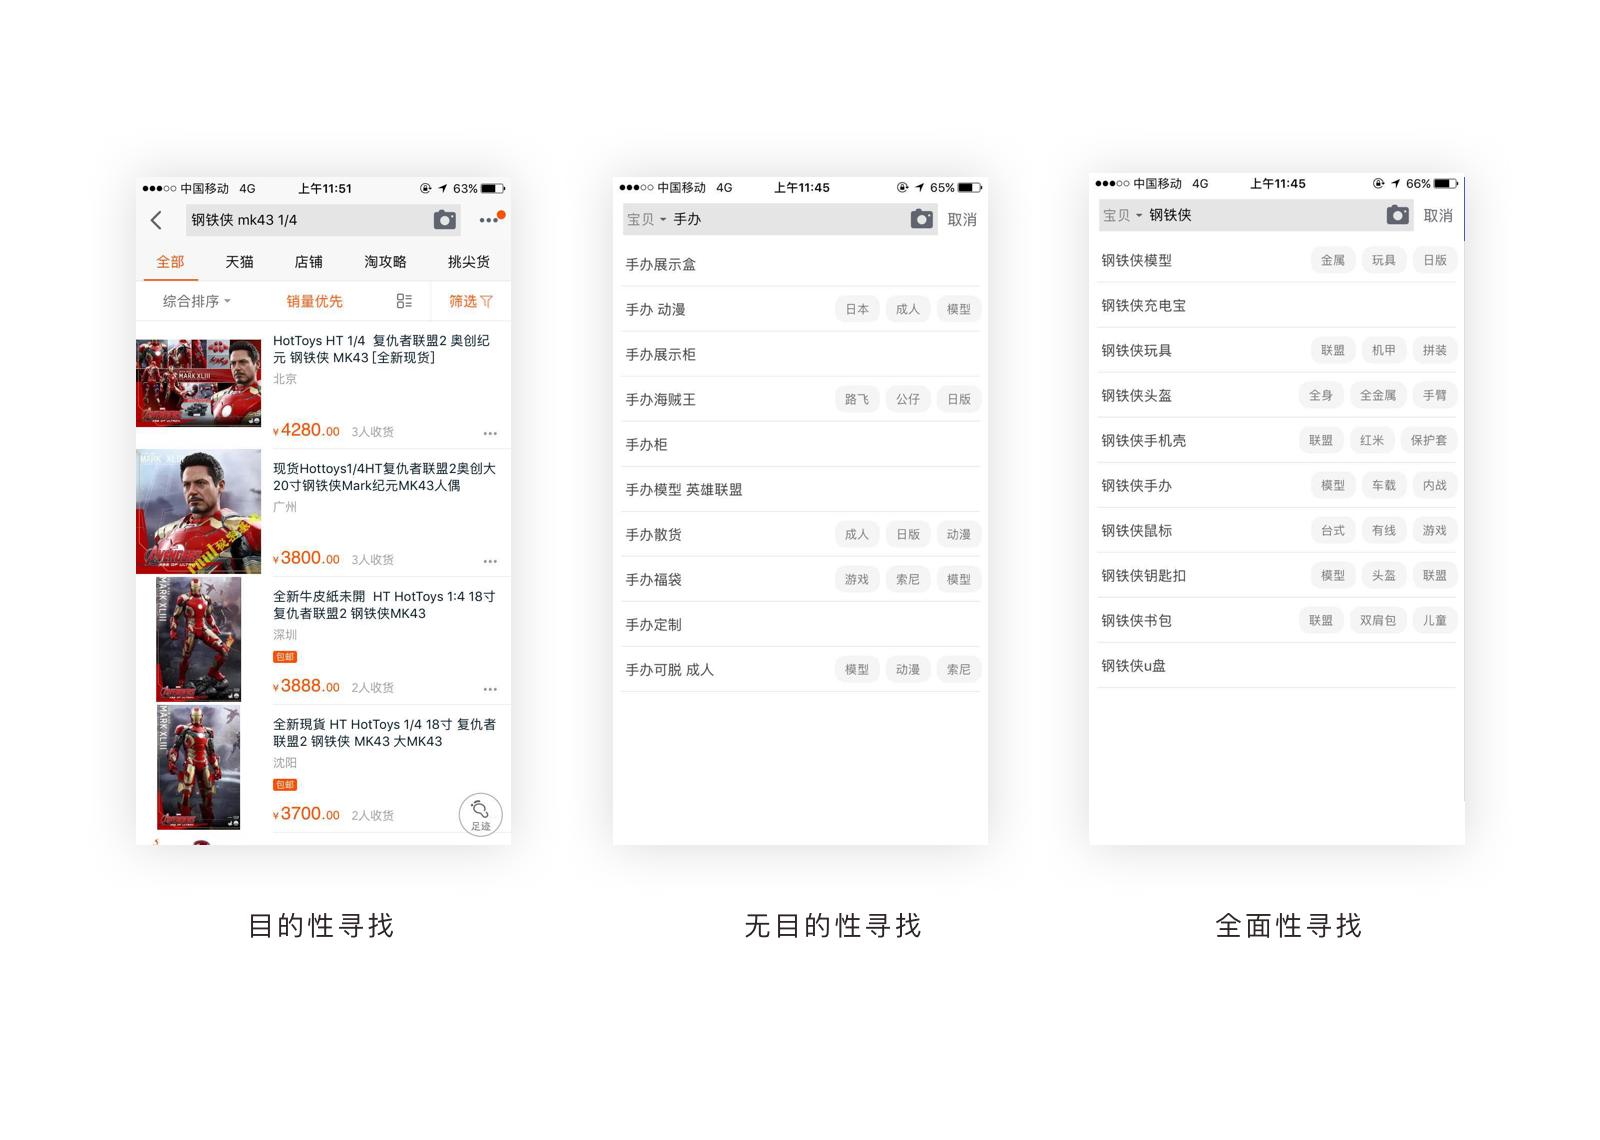 iPhone 6 Copy 2